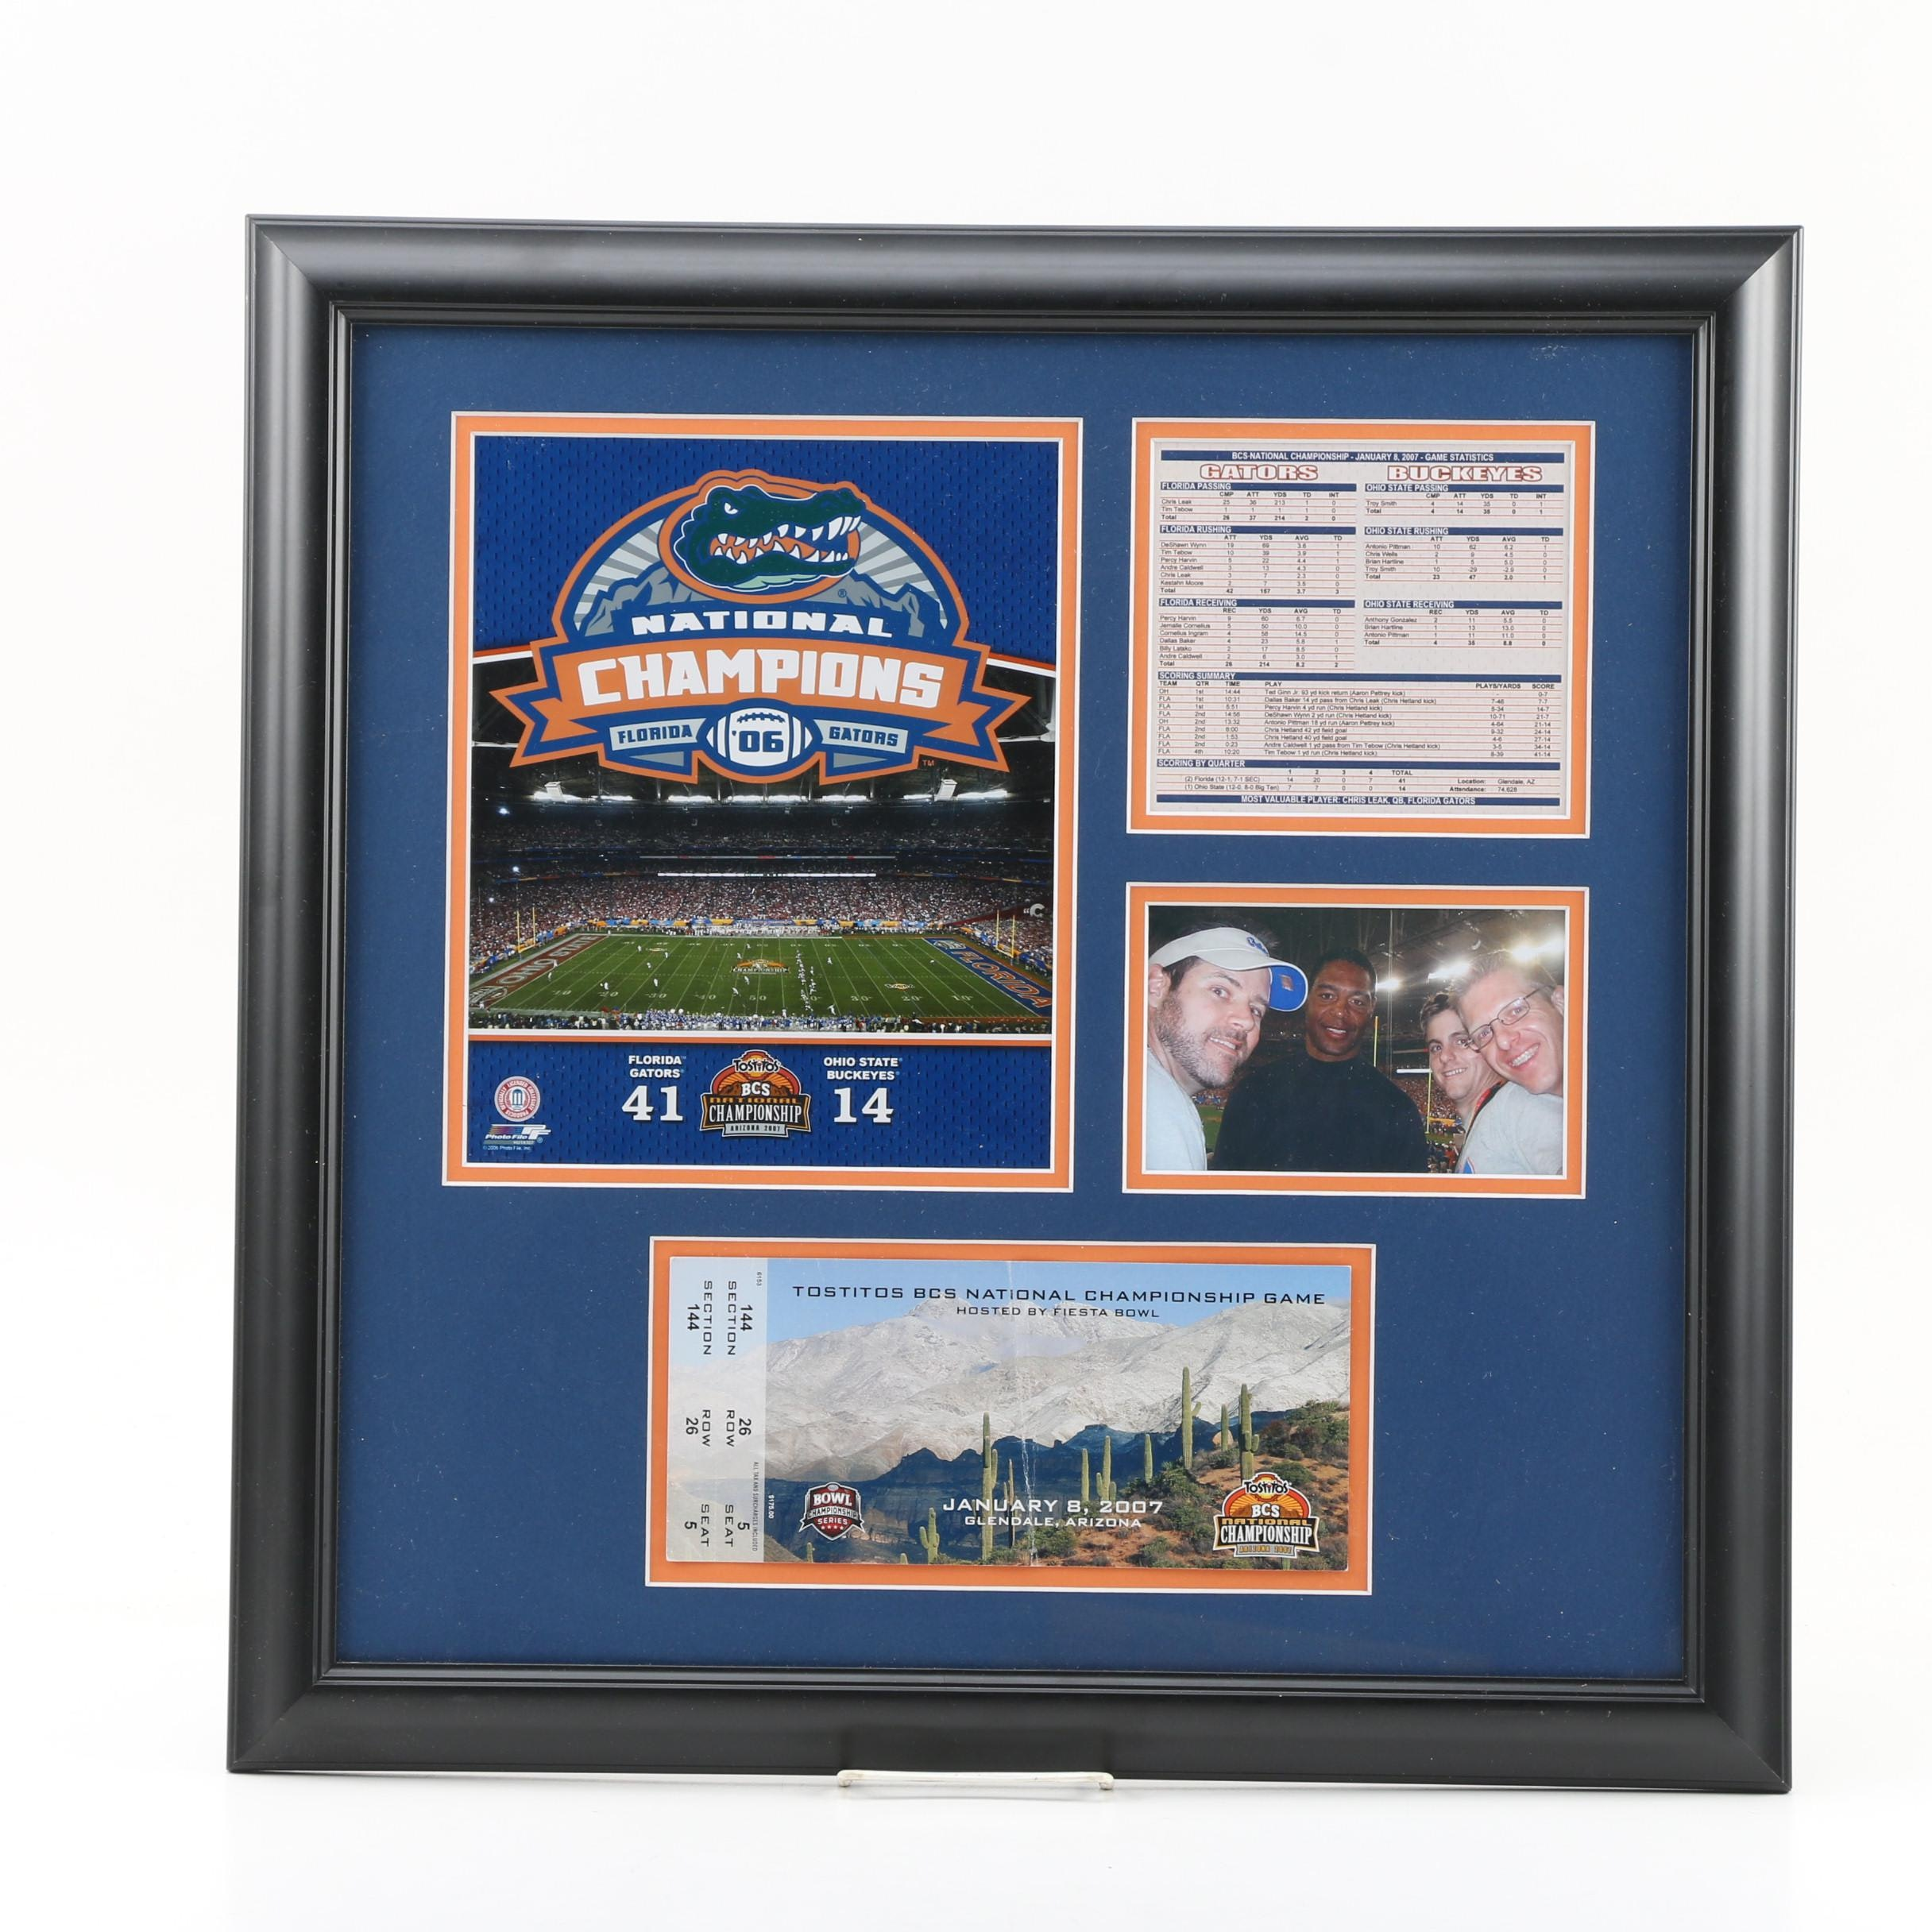 2006 Florida Gators National Champions Plaque